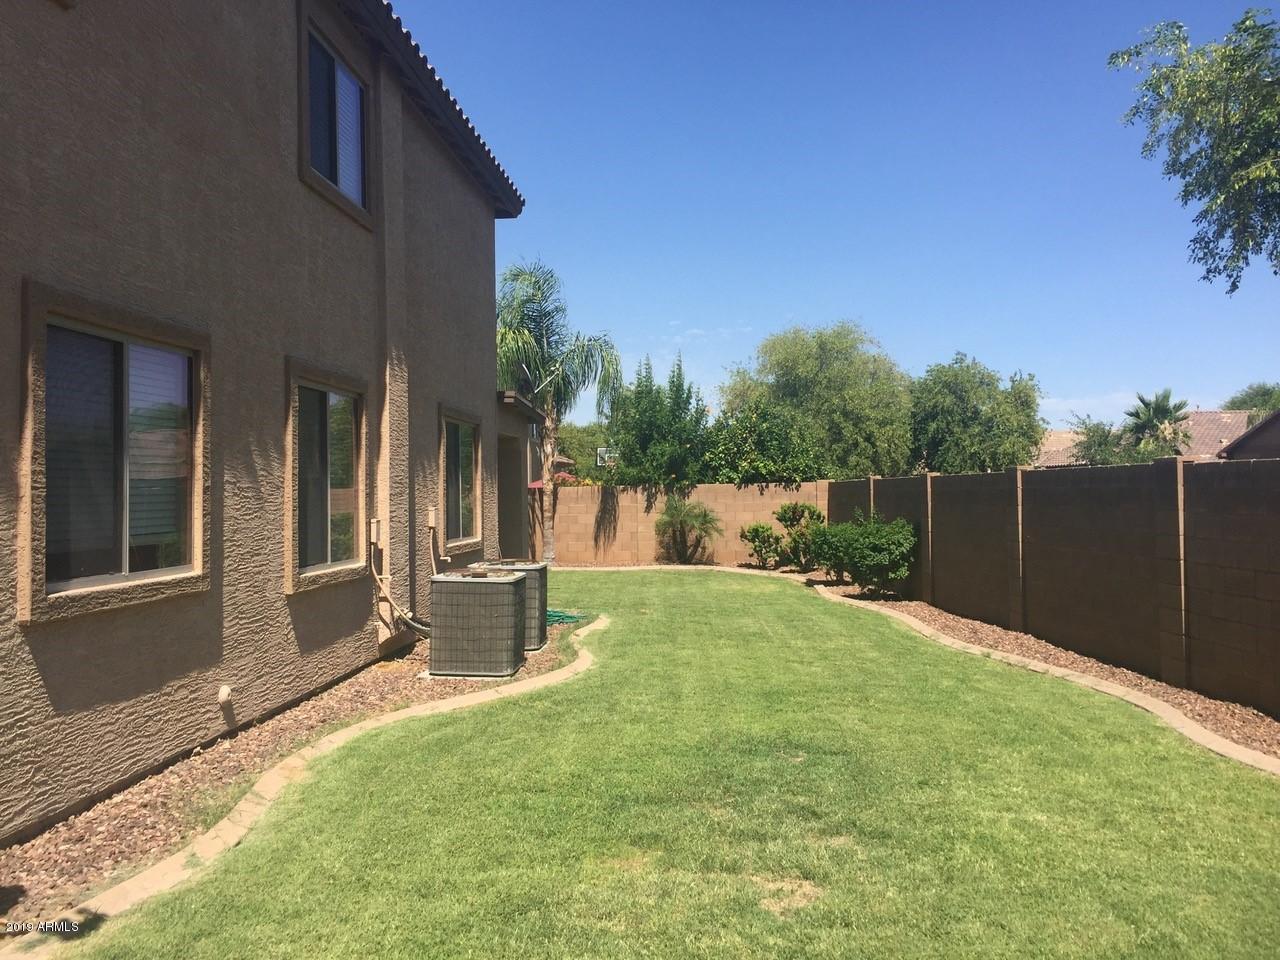 MLS 5944236 11843 N 146TH Avenue, Surprise, AZ 85379 Surprise AZ Mountain Gate